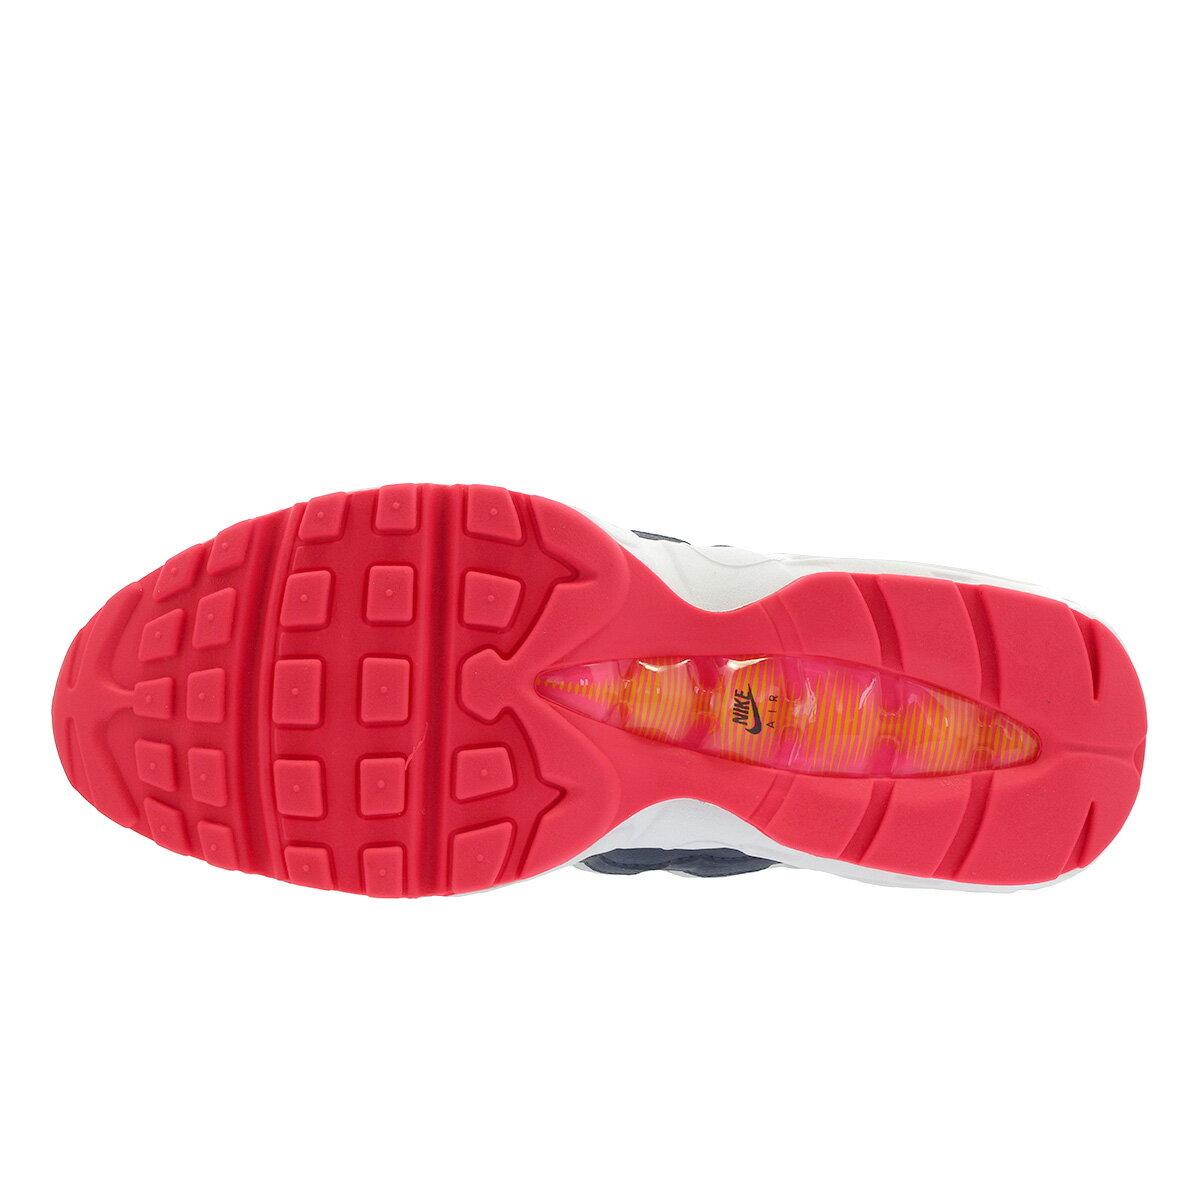 NIKE WMNS AIR MAX 95 Nike women Air Max 95 PURE PLATINUMMIDNIGHT NAVYLASER ORANGE 307,960 405